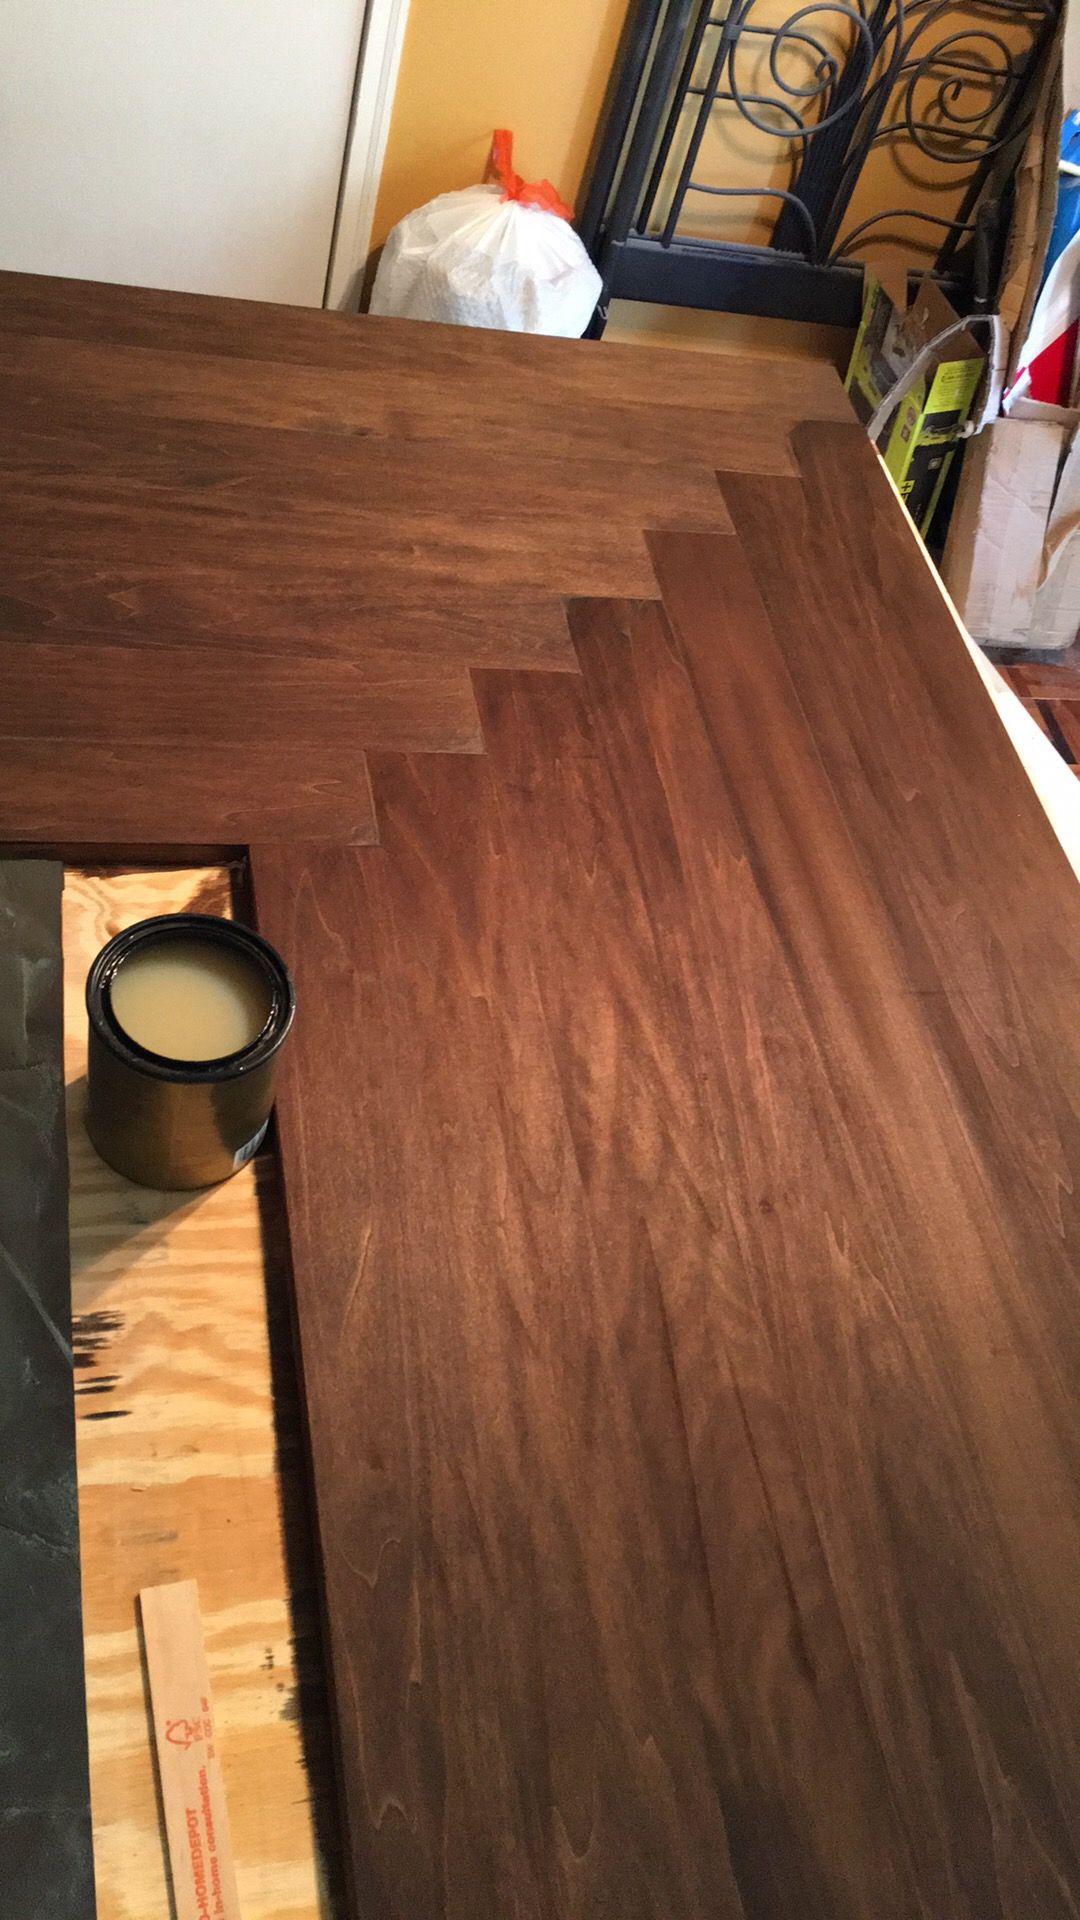 Used a little bit of medium walnut minwax stain to cover the wood used a little bit of medium walnut minwax stain to cover the wood filler in the nvjuhfo Images